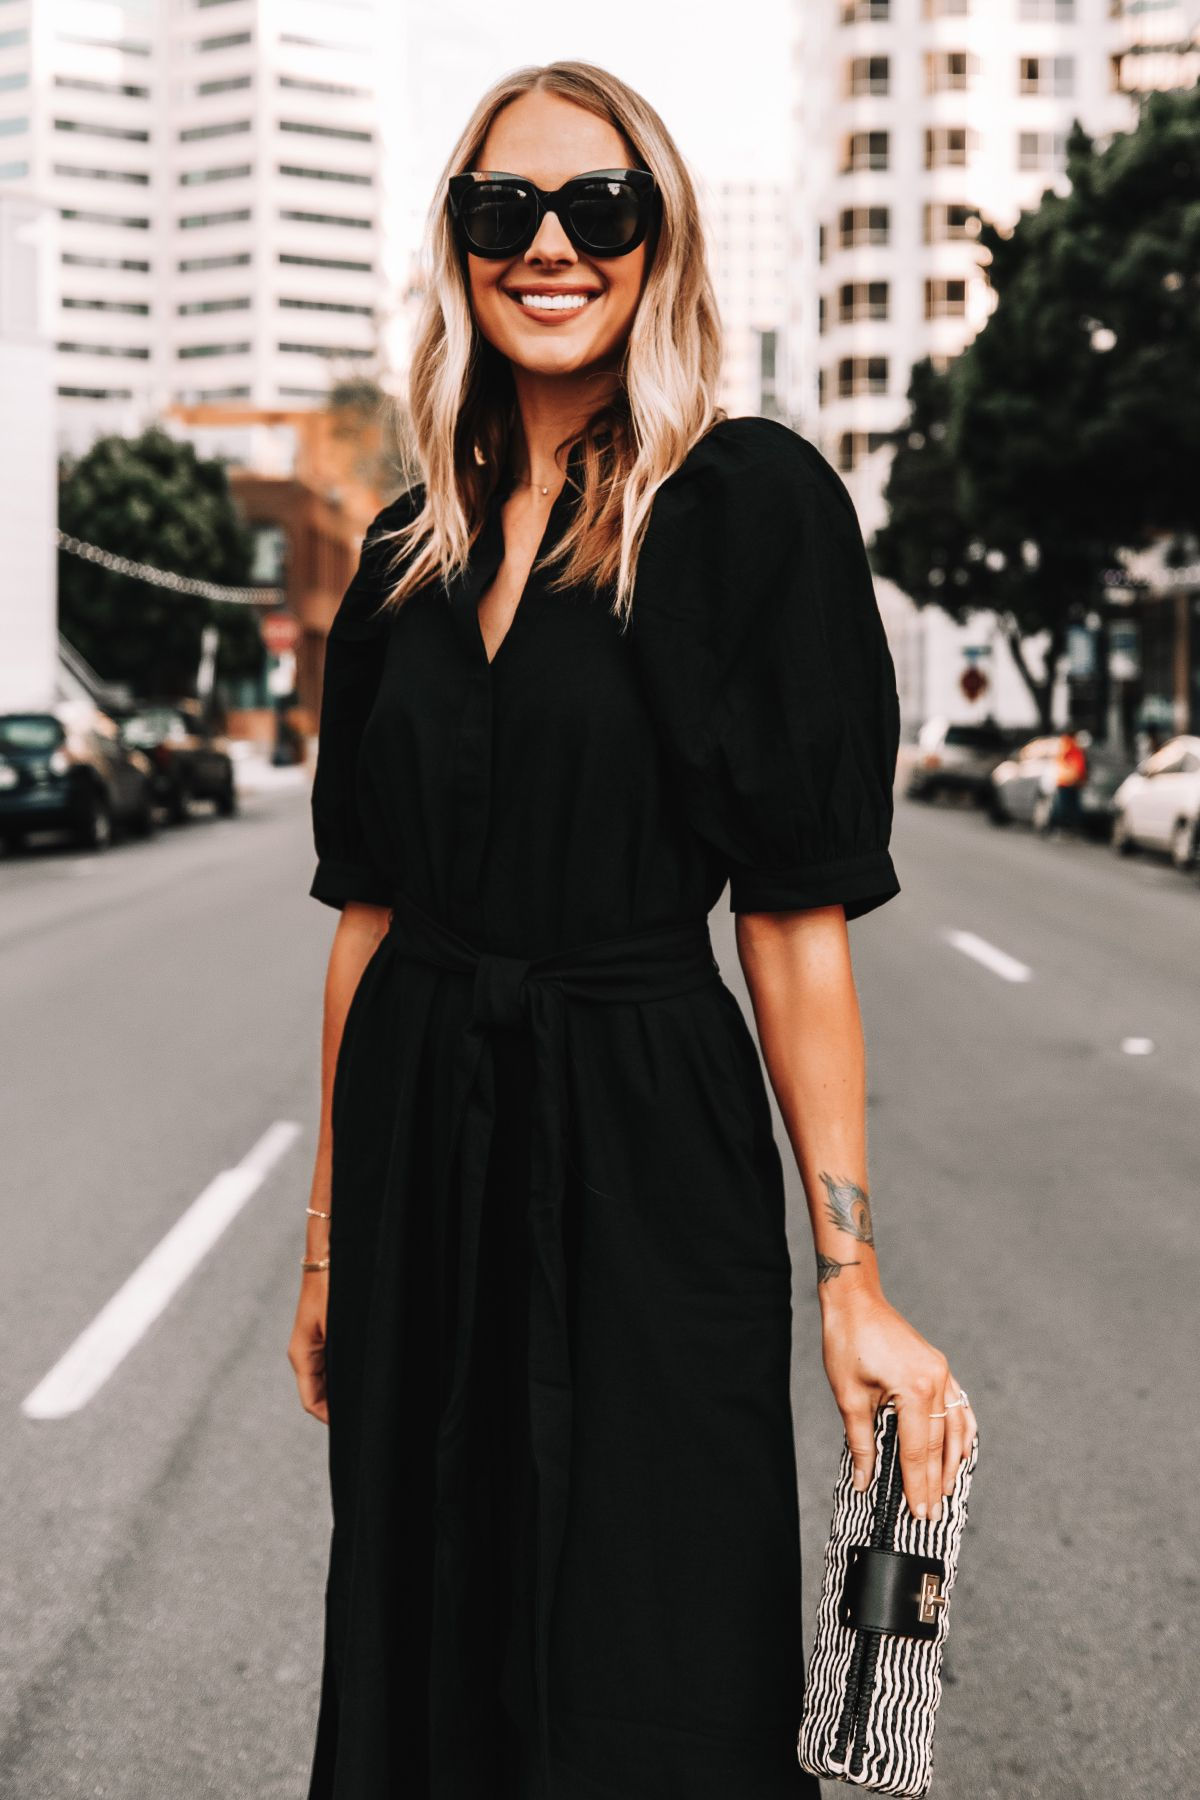 Pin By Betsy Williams On Fashionjackson Fashion Summer Black Dress Fashion Jackson [ 1800 x 1200 Pixel ]